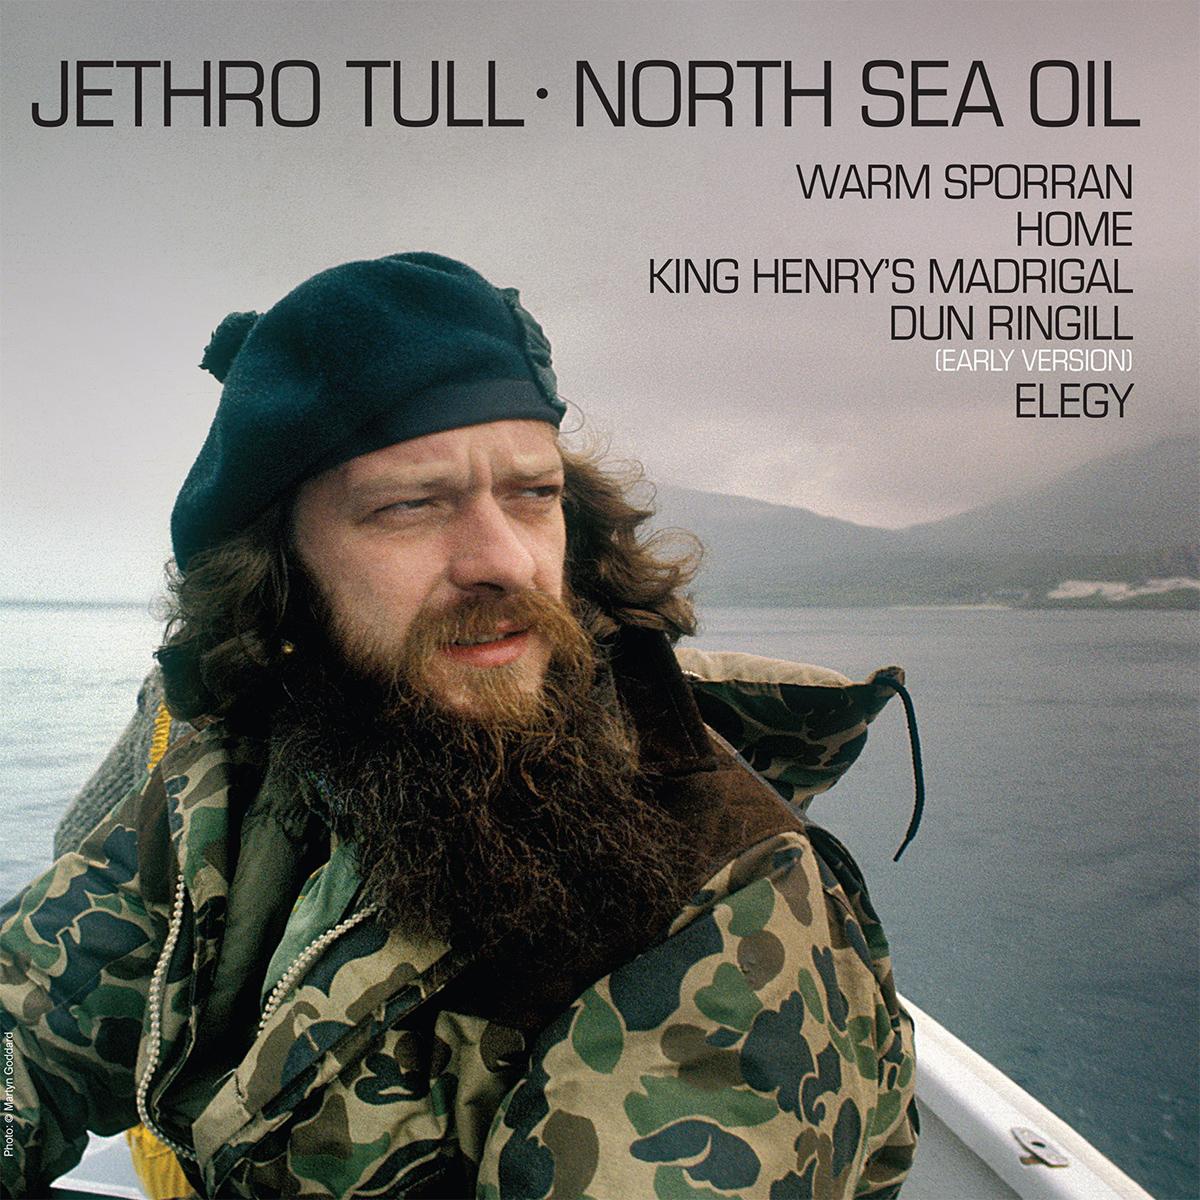 Jethro Tull Tull. North Sea Oil